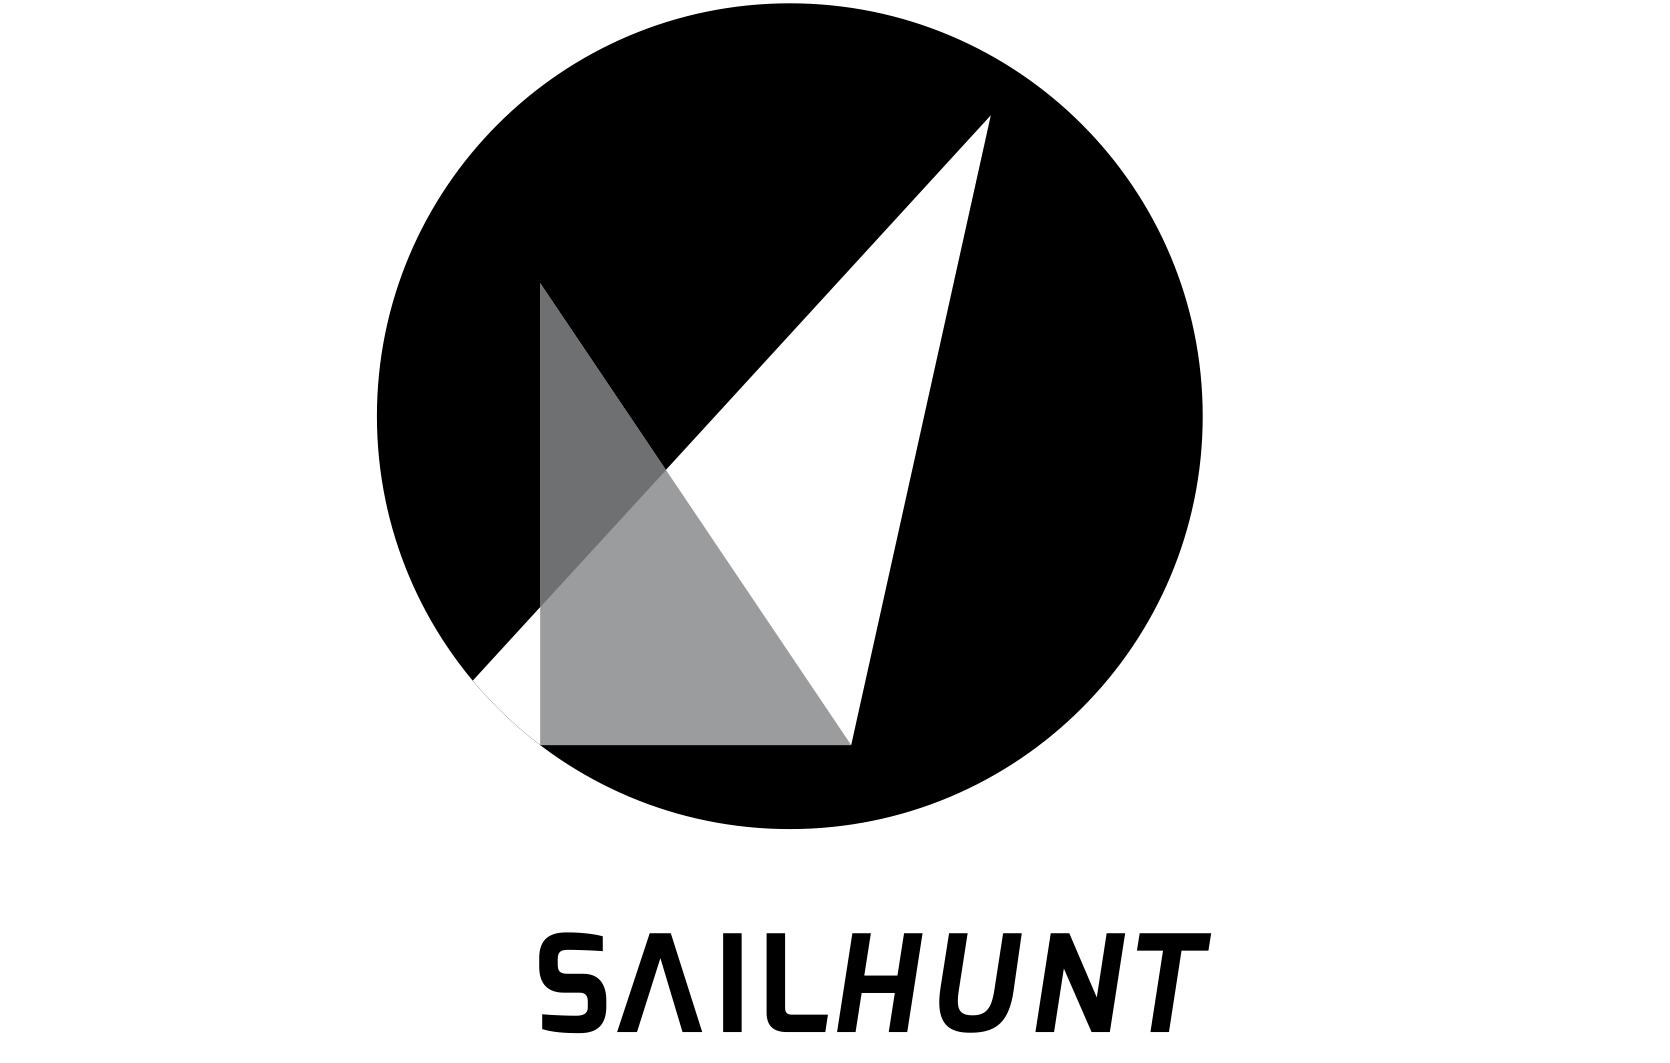 Sailhunt